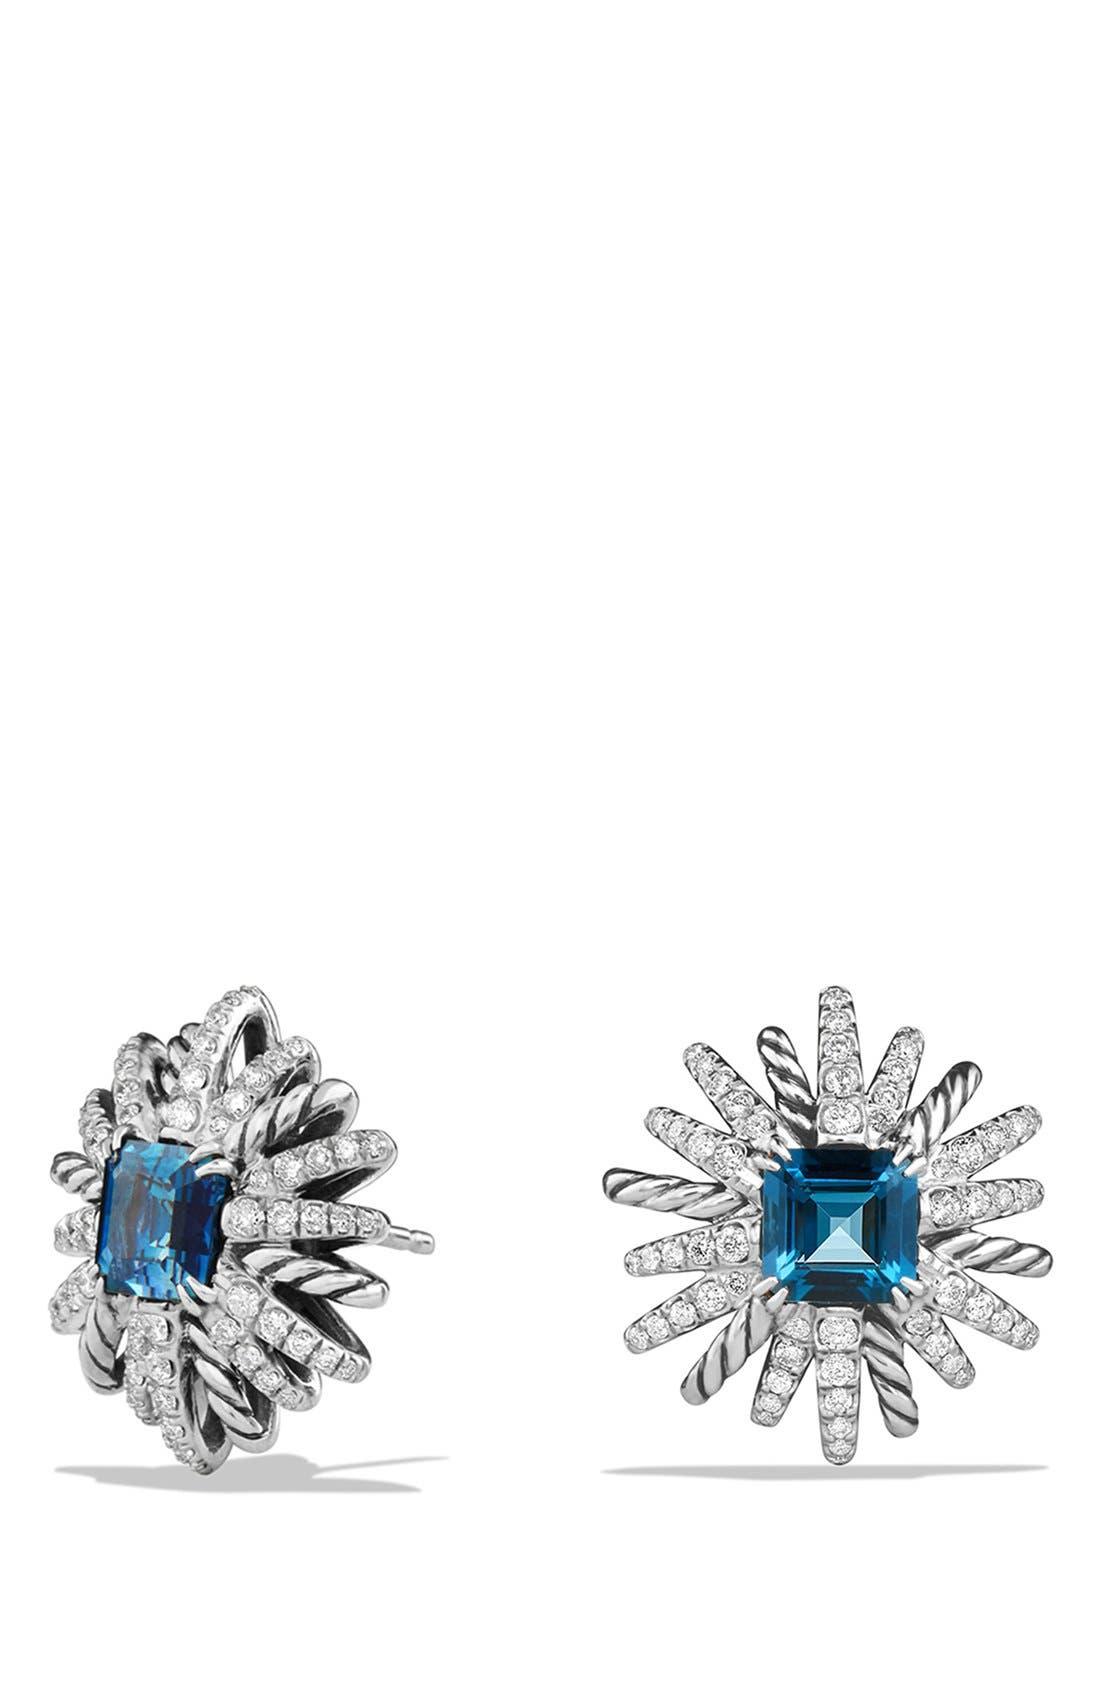 David Yurman 'Starburst' Earrings